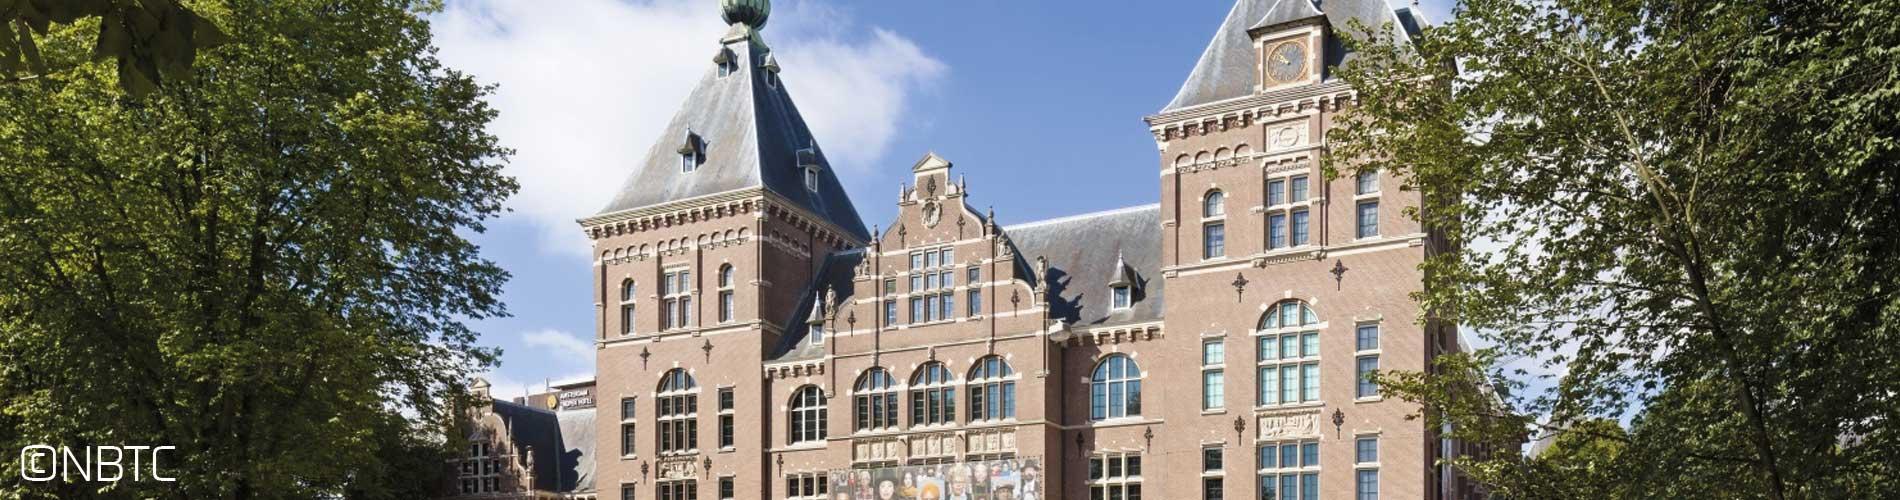 Blog_BestMuseumsAmsterdam_Tropenmuseum_1900x500_Q120